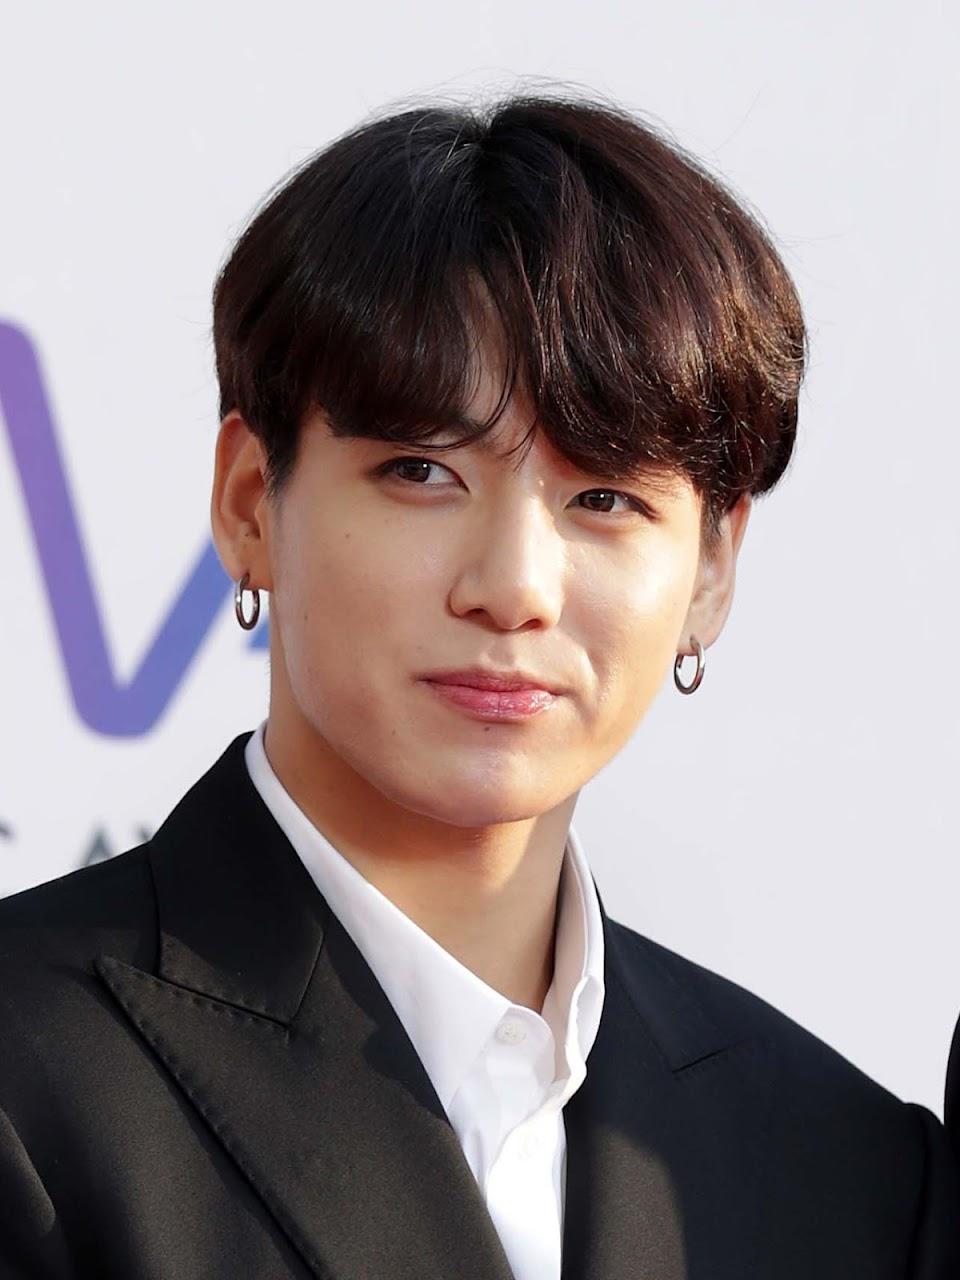 BTS Jungkook The Fact Music Awards